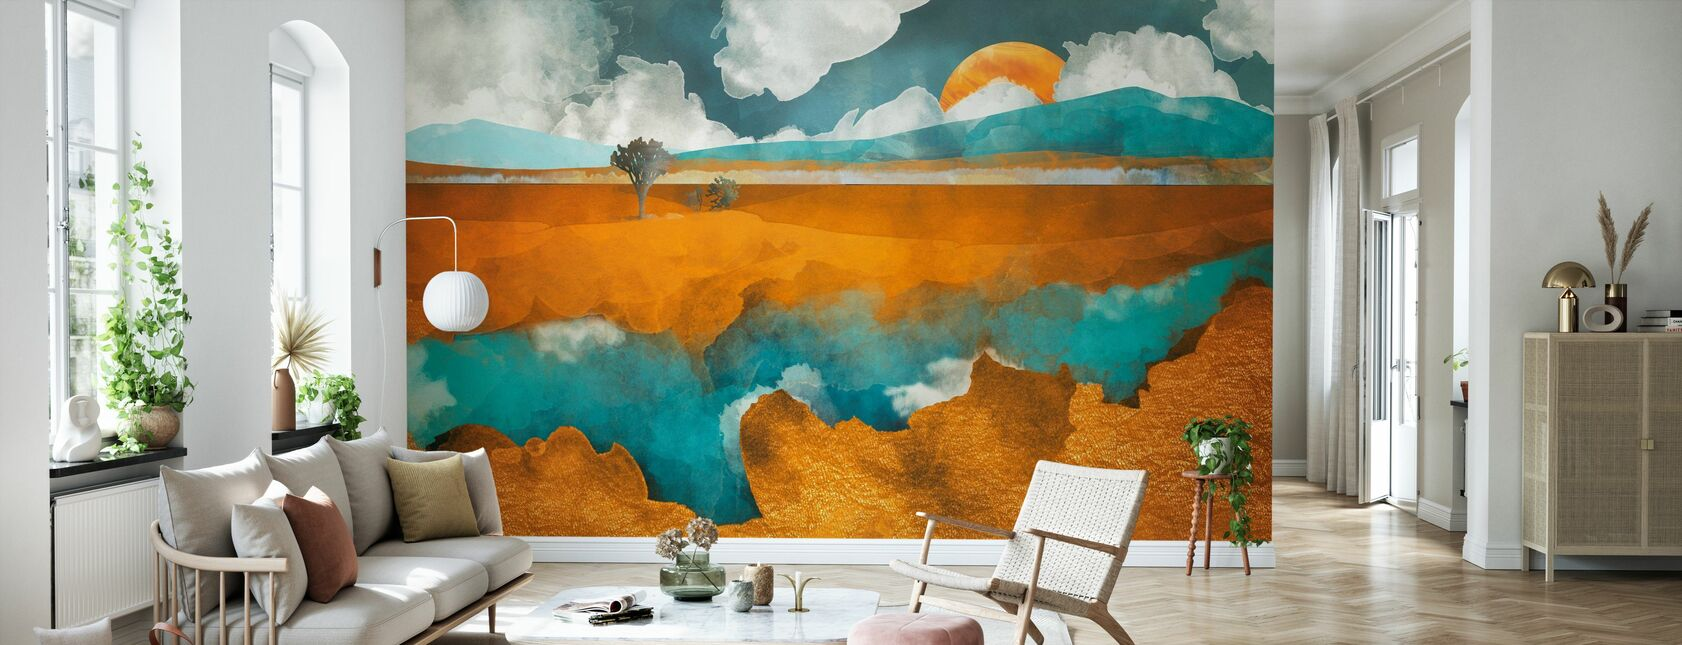 Desert River - SpaceFrogDesigns - Wallpaper - Living Room